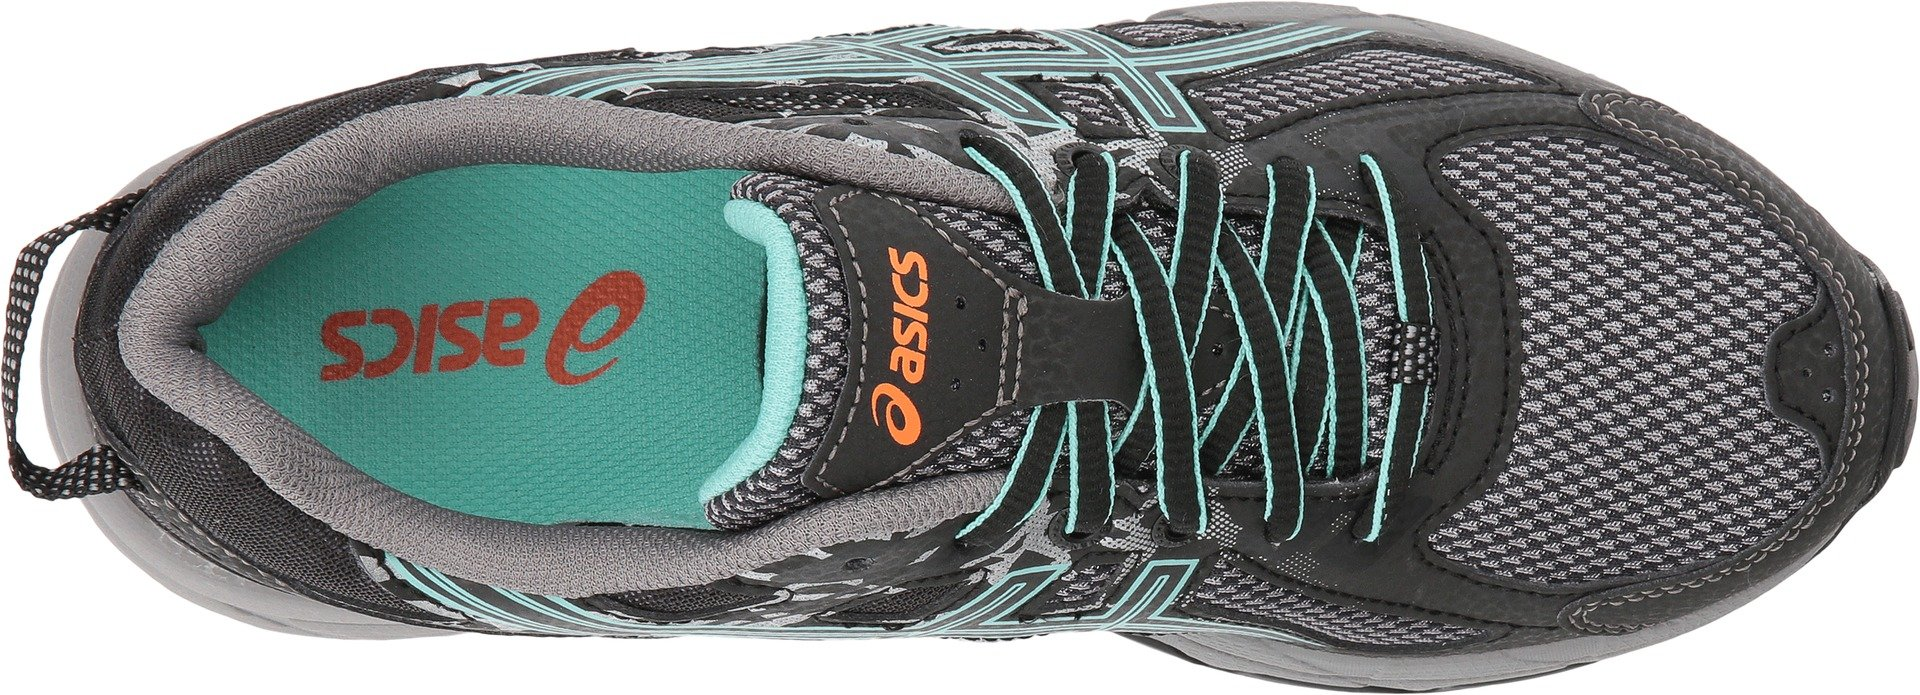 ASICS Womens Gel-Venture 6 Running Shoes Black/Ice Green/Orange 5 B(M) US by ASICS (Image #2)